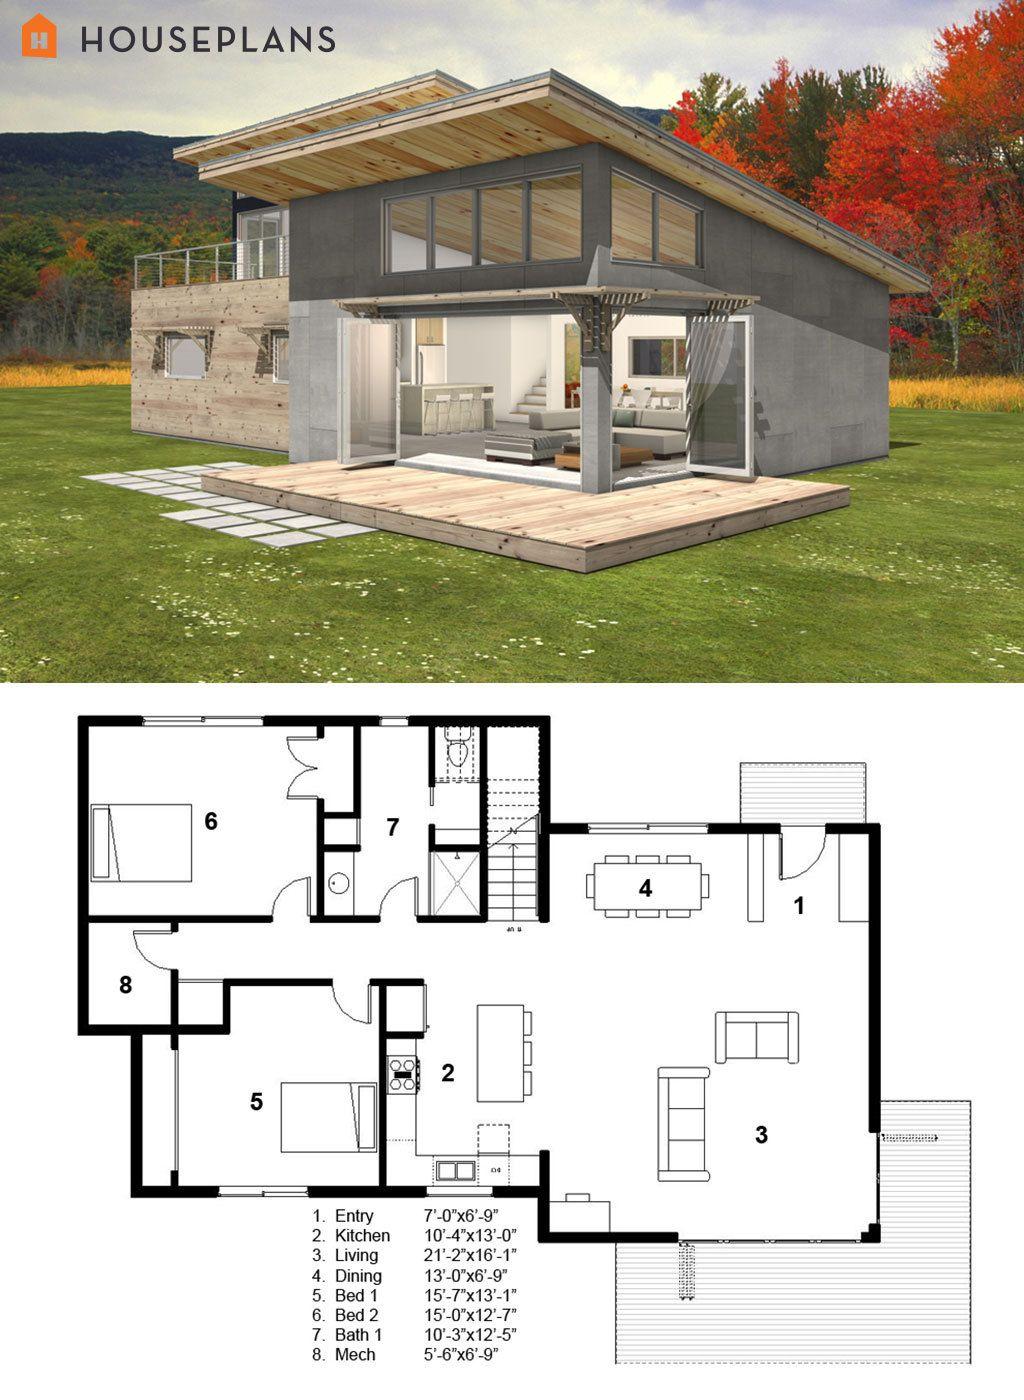 Modern Style House Plan 3 Beds 2 Baths 2115 Sq Ft Plan 497 31 Small Modern Cabin Modern Style House Plans Cabin House Plans